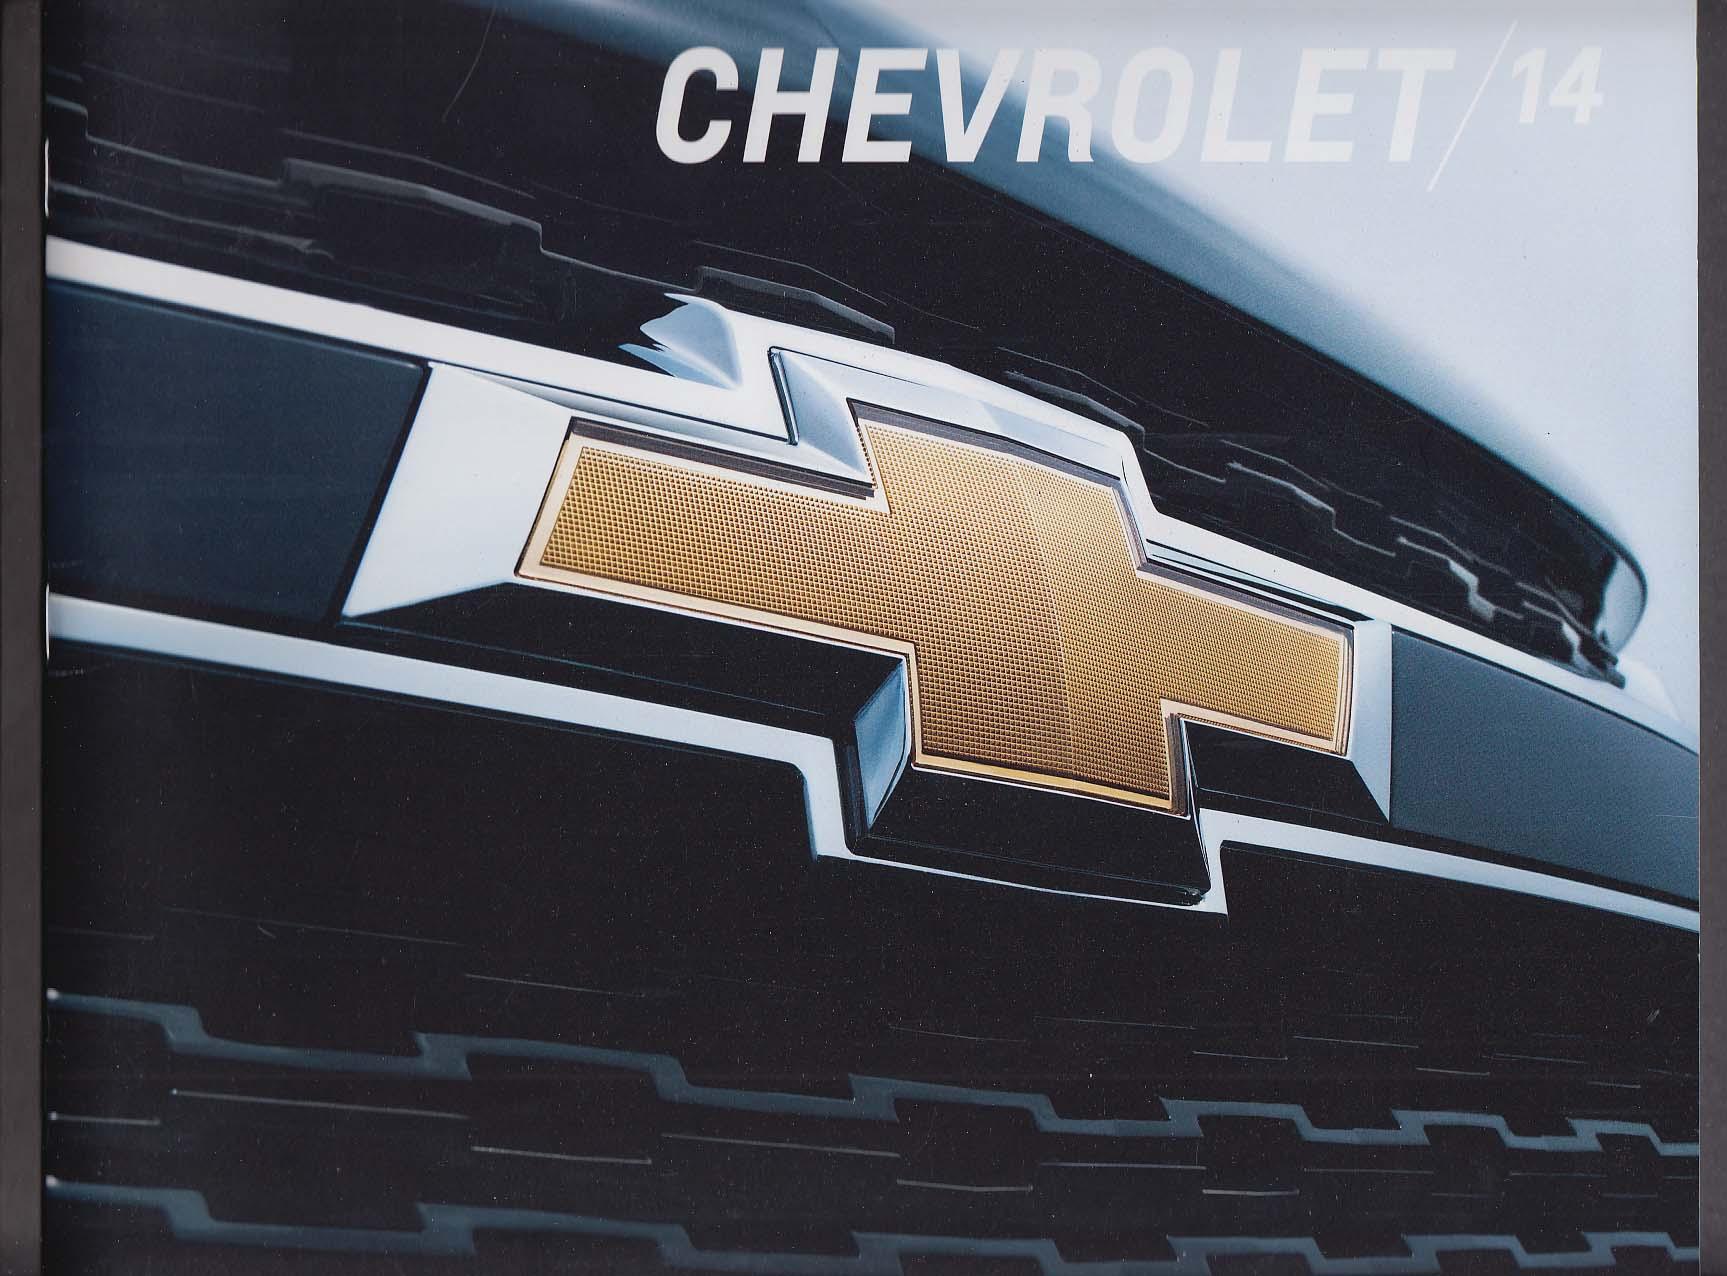 Image for 2014 Chevrolet sales brochure catalog Impala Corvette Stingray Silverado Camaro